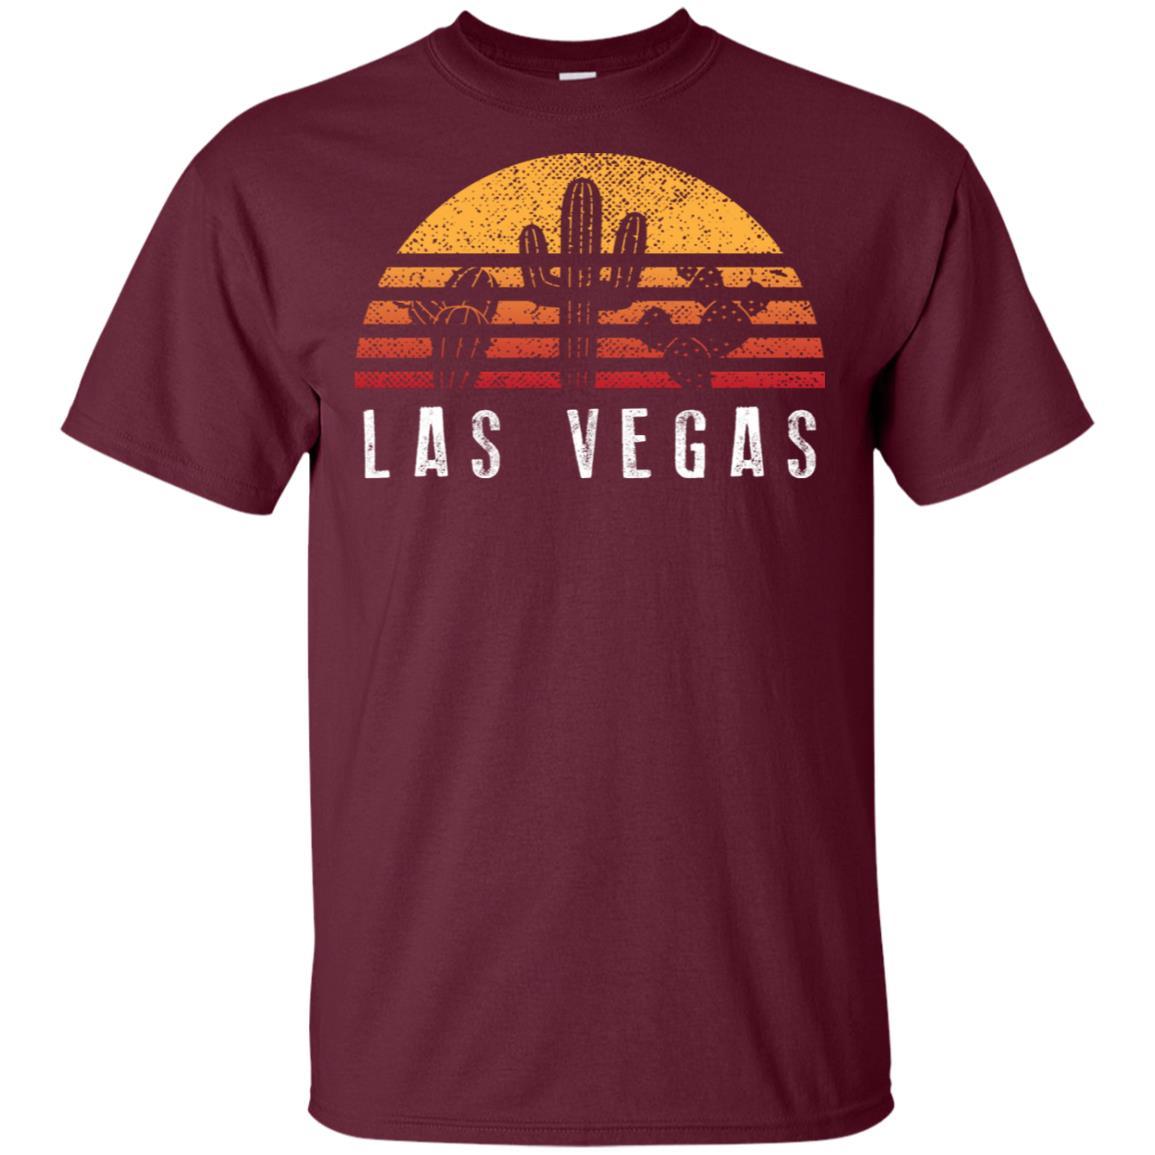 Las Vegas Retro Sunset Cactus Cool Vacation Gift Unisex Short Sleeve